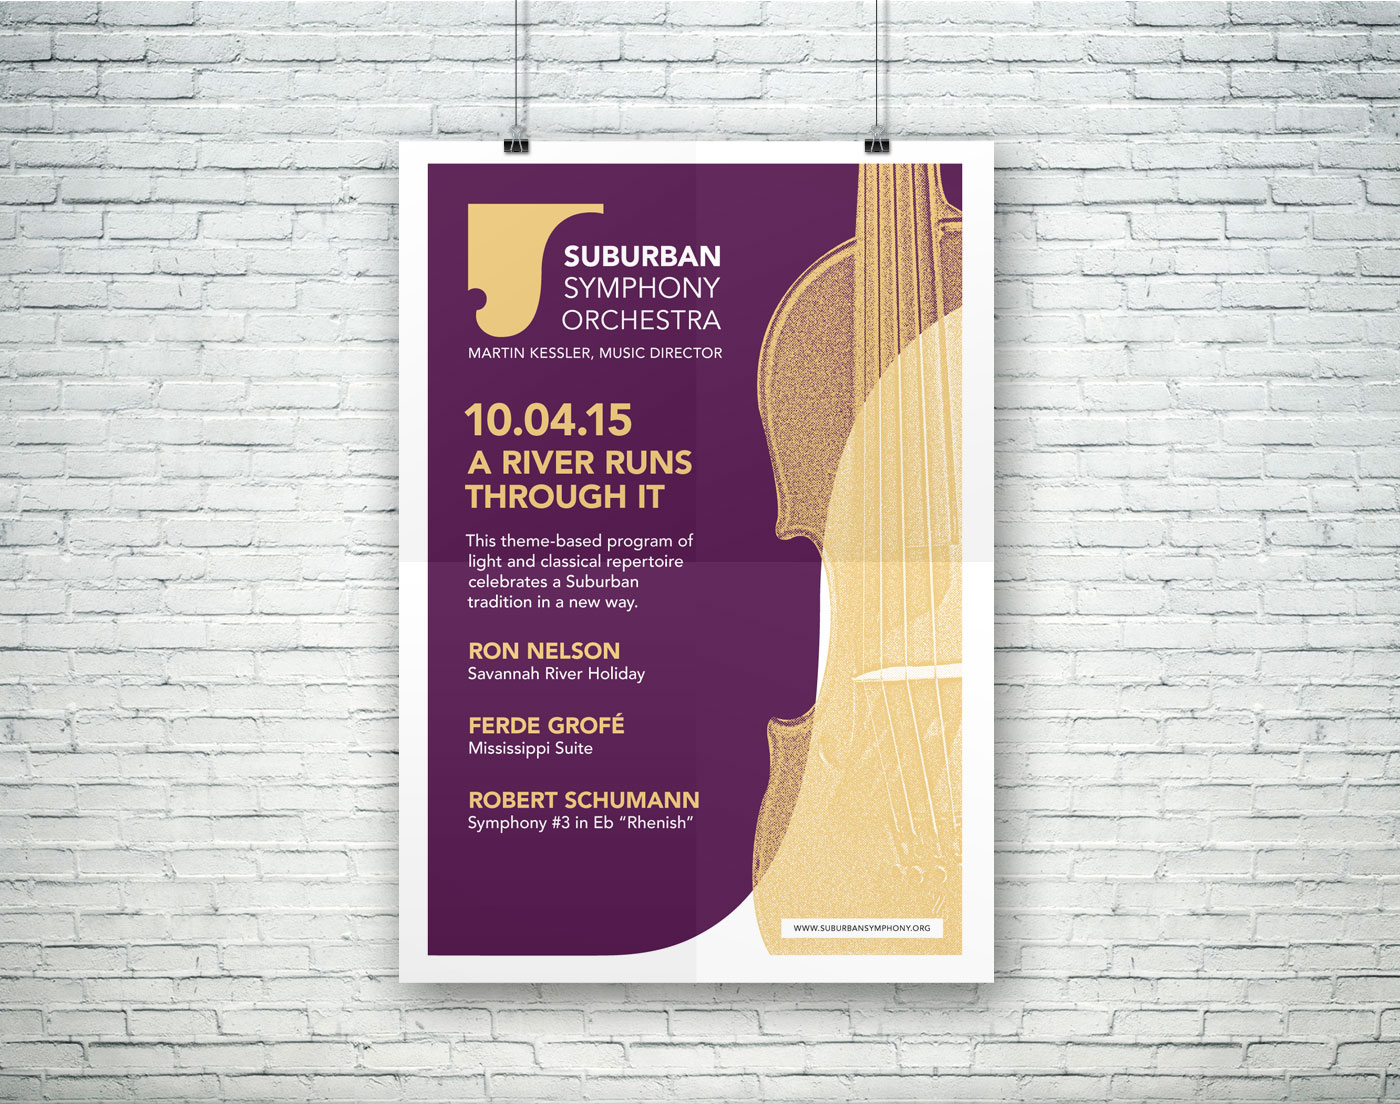 Suburban Symphony Orchestra poster